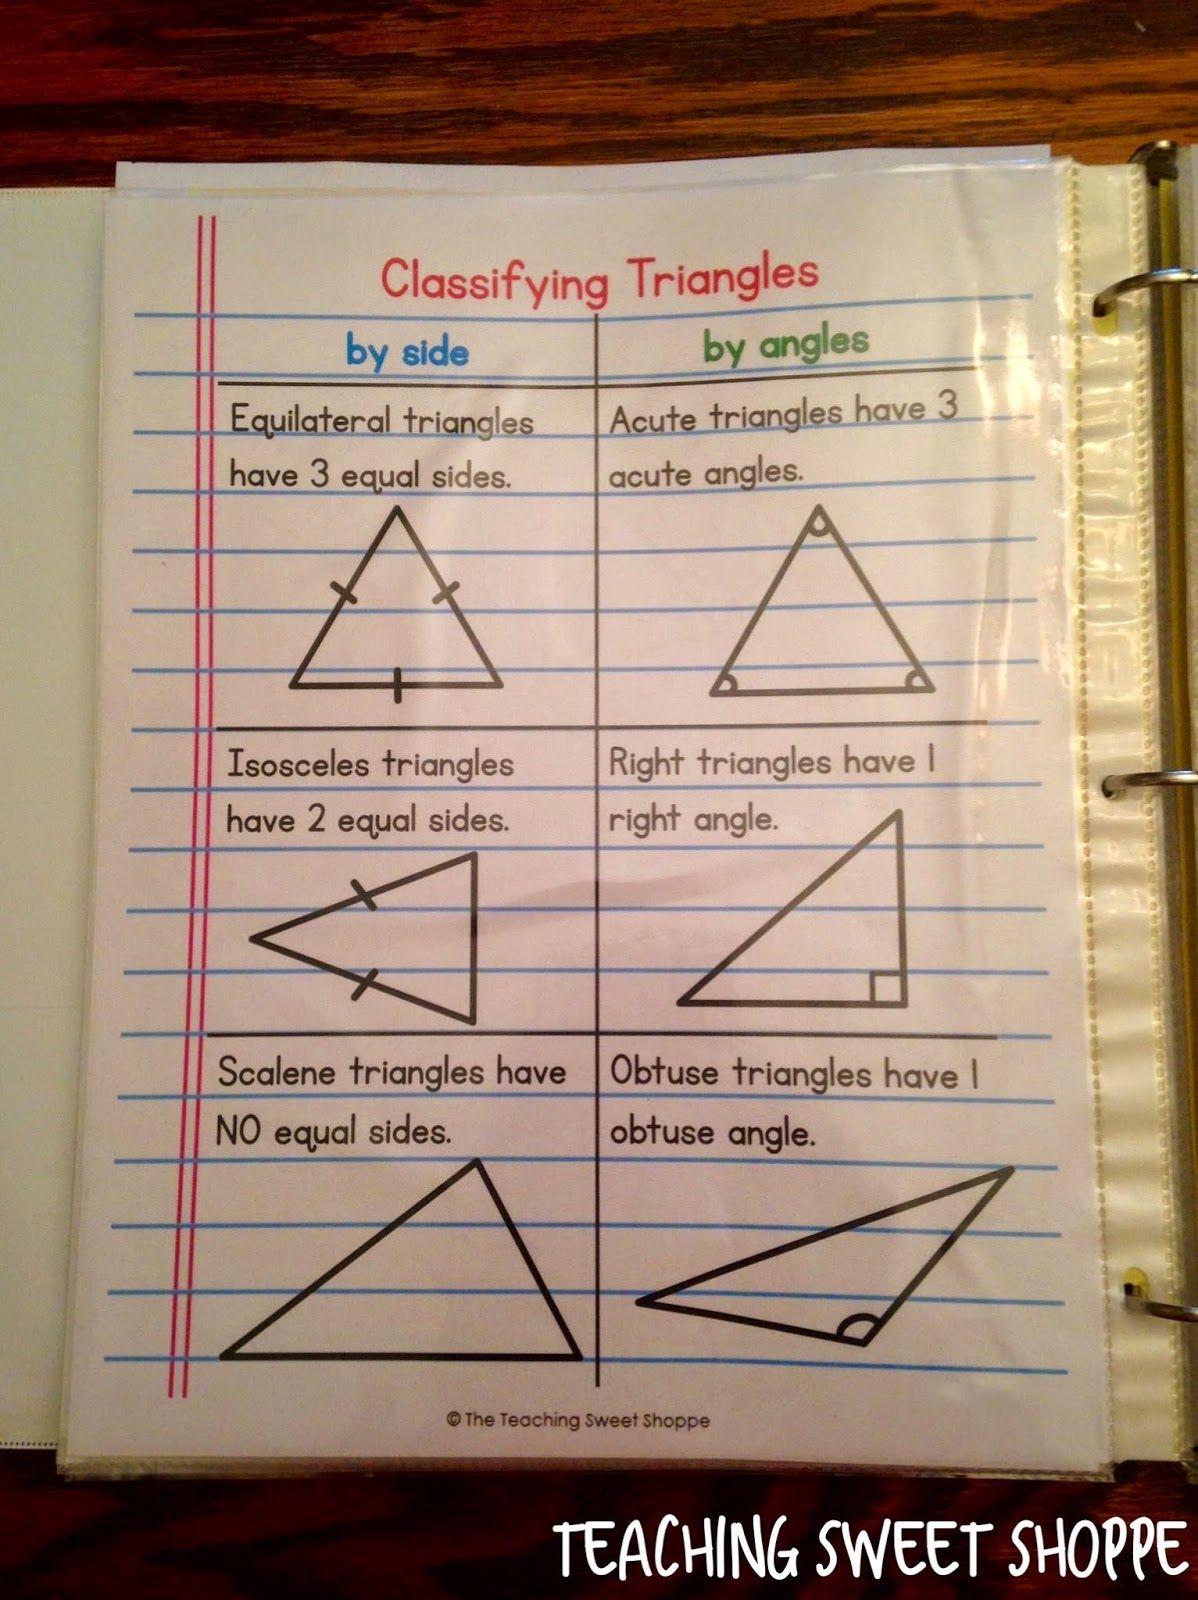 The Teaching Sweet Shoppe Organizing My Geometry Unit